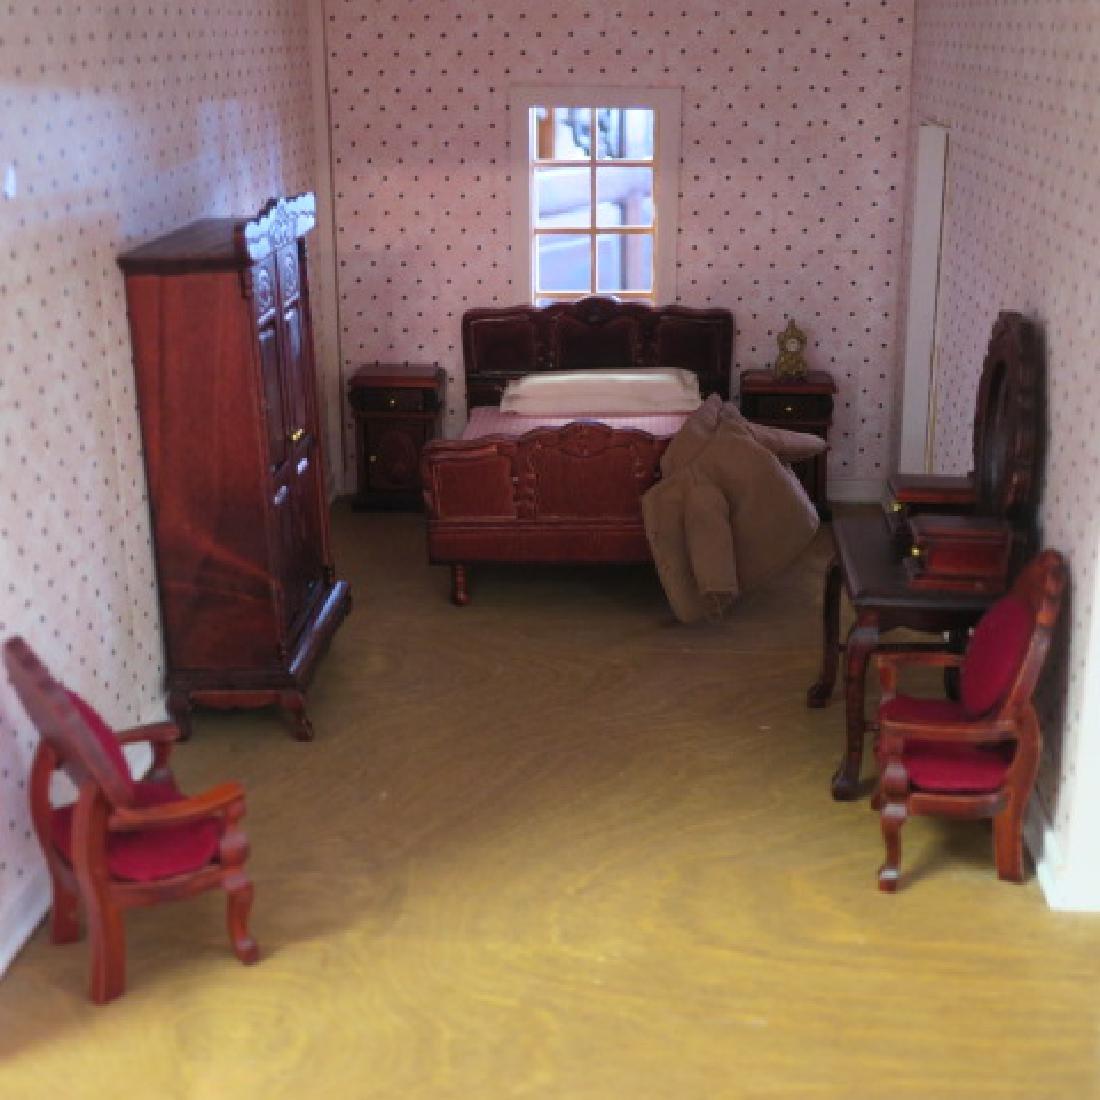 MELISSA & DOUG Doll House Furniture: